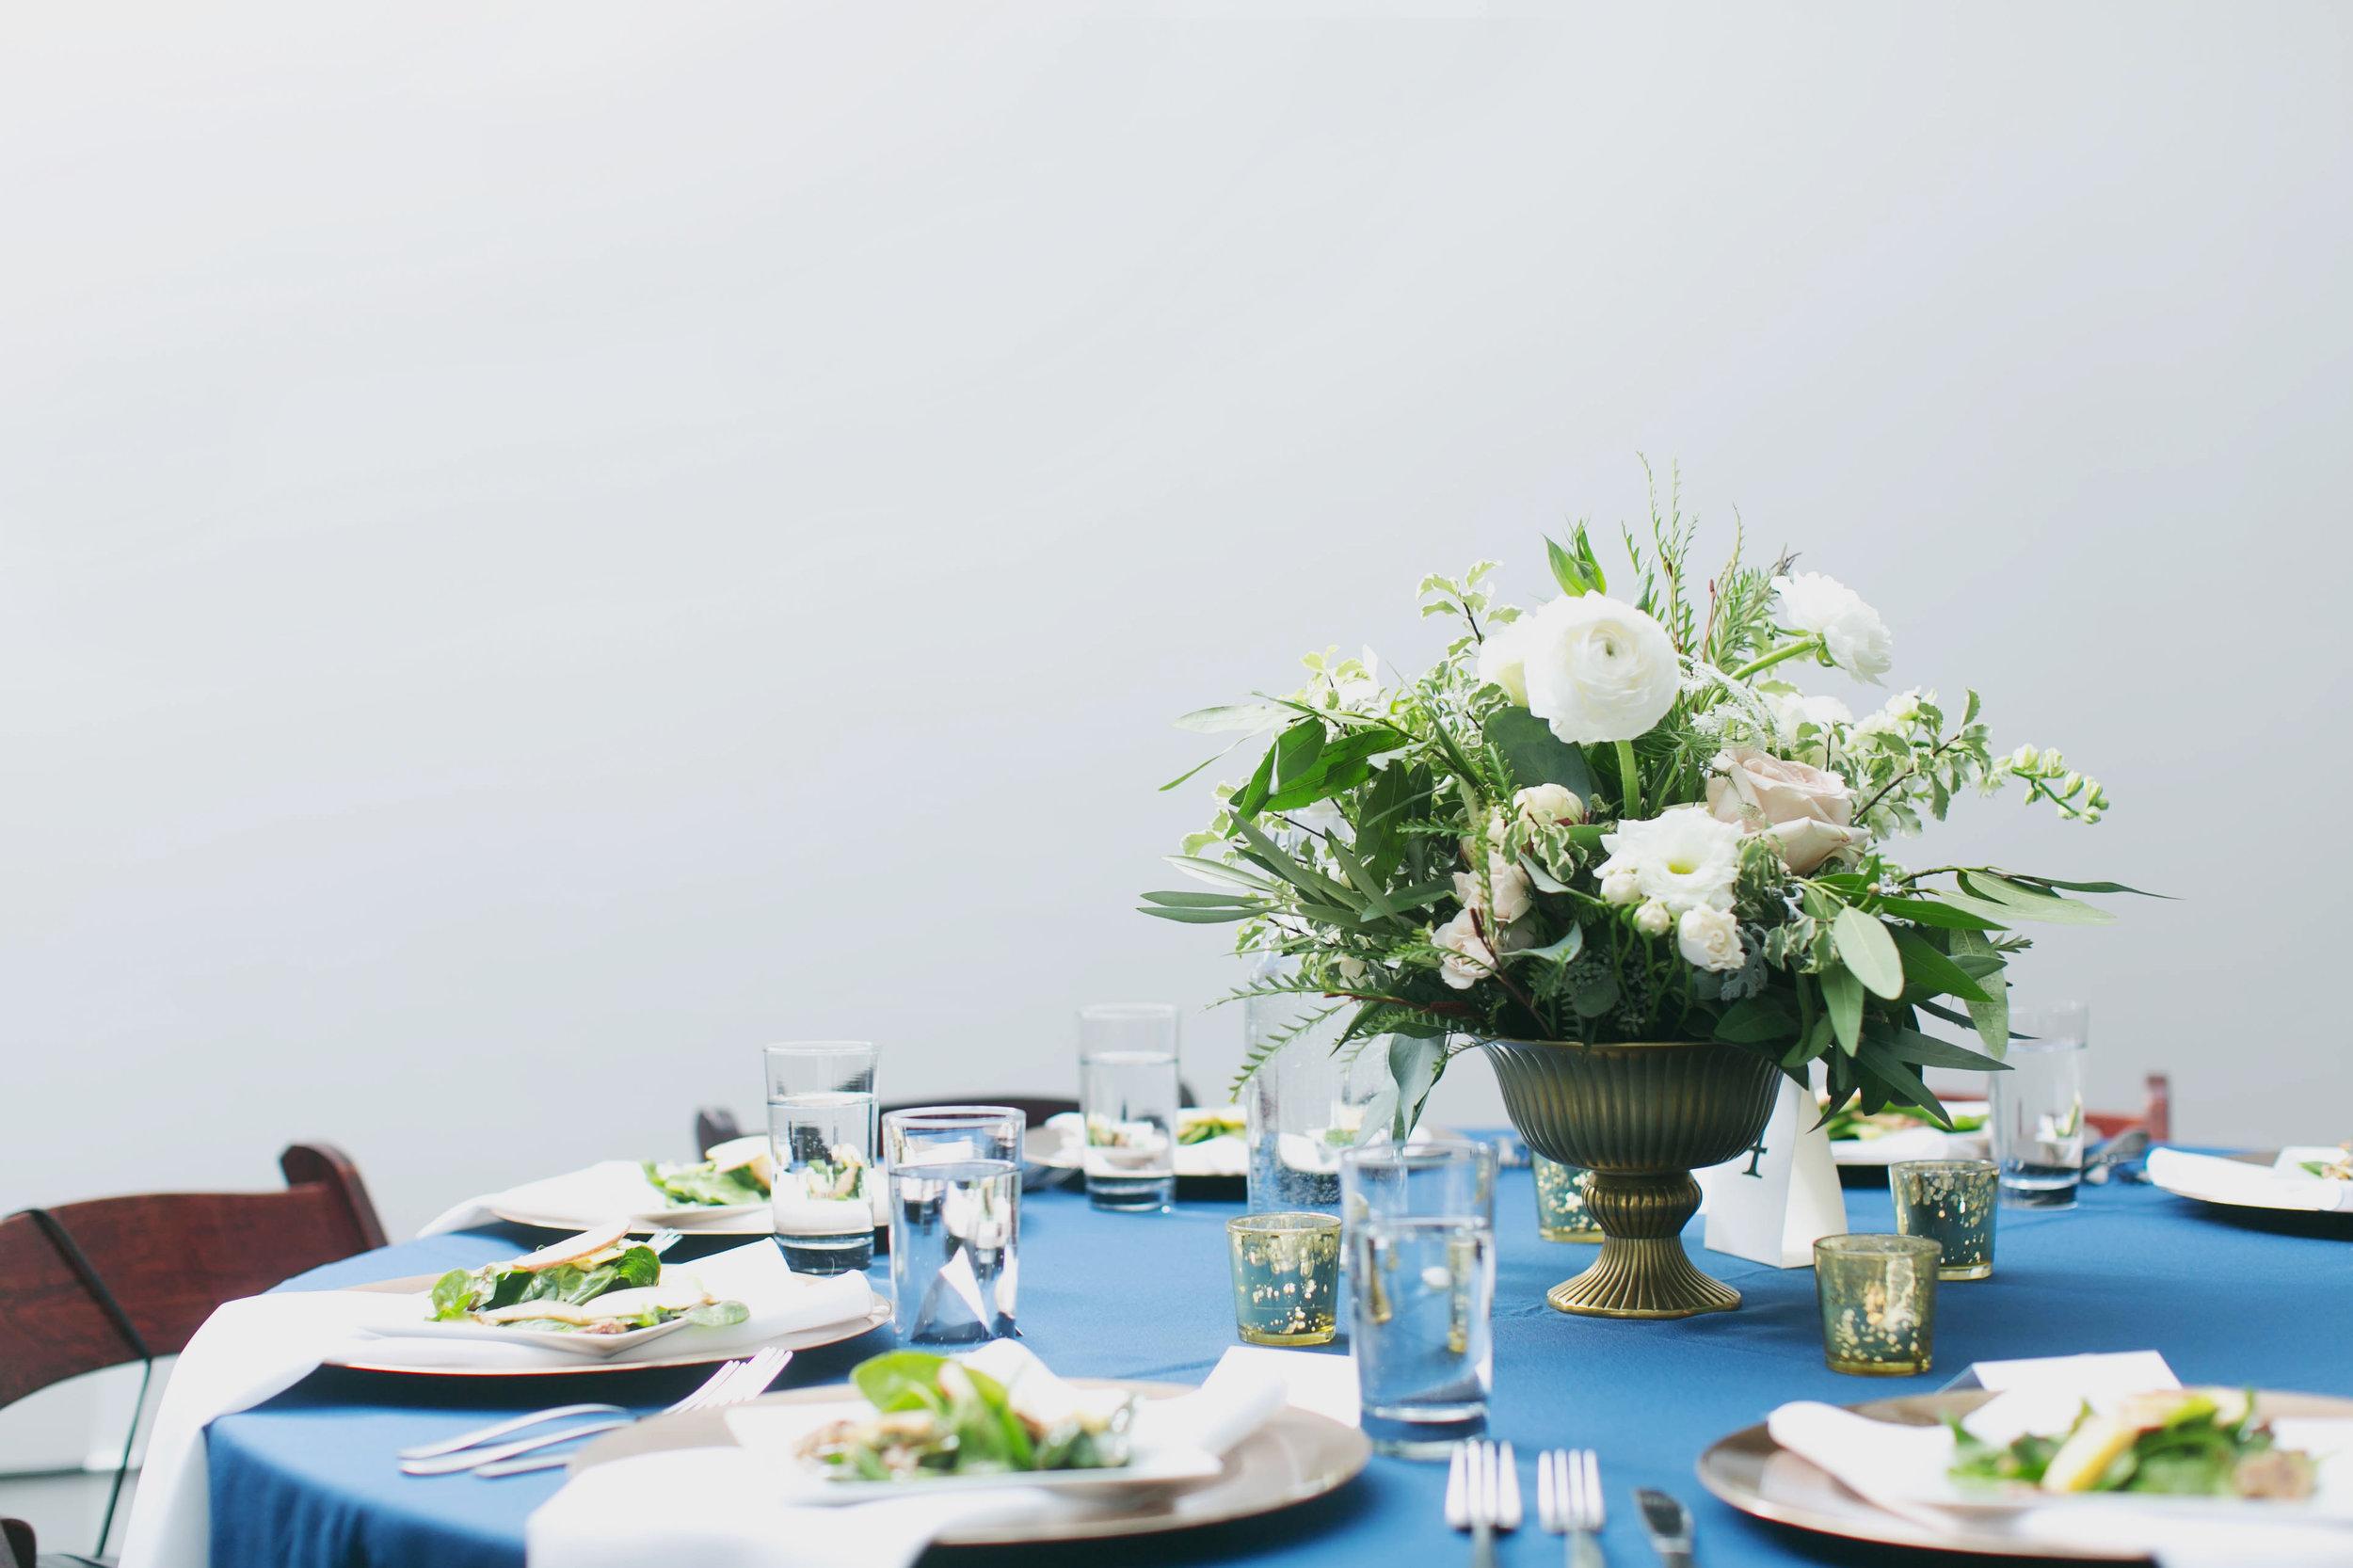 Simply-Charming-Socials_Atlanta-Wedding-Planner_Our-Labor-Of-Love_Emily-and-Jon_21.jpg